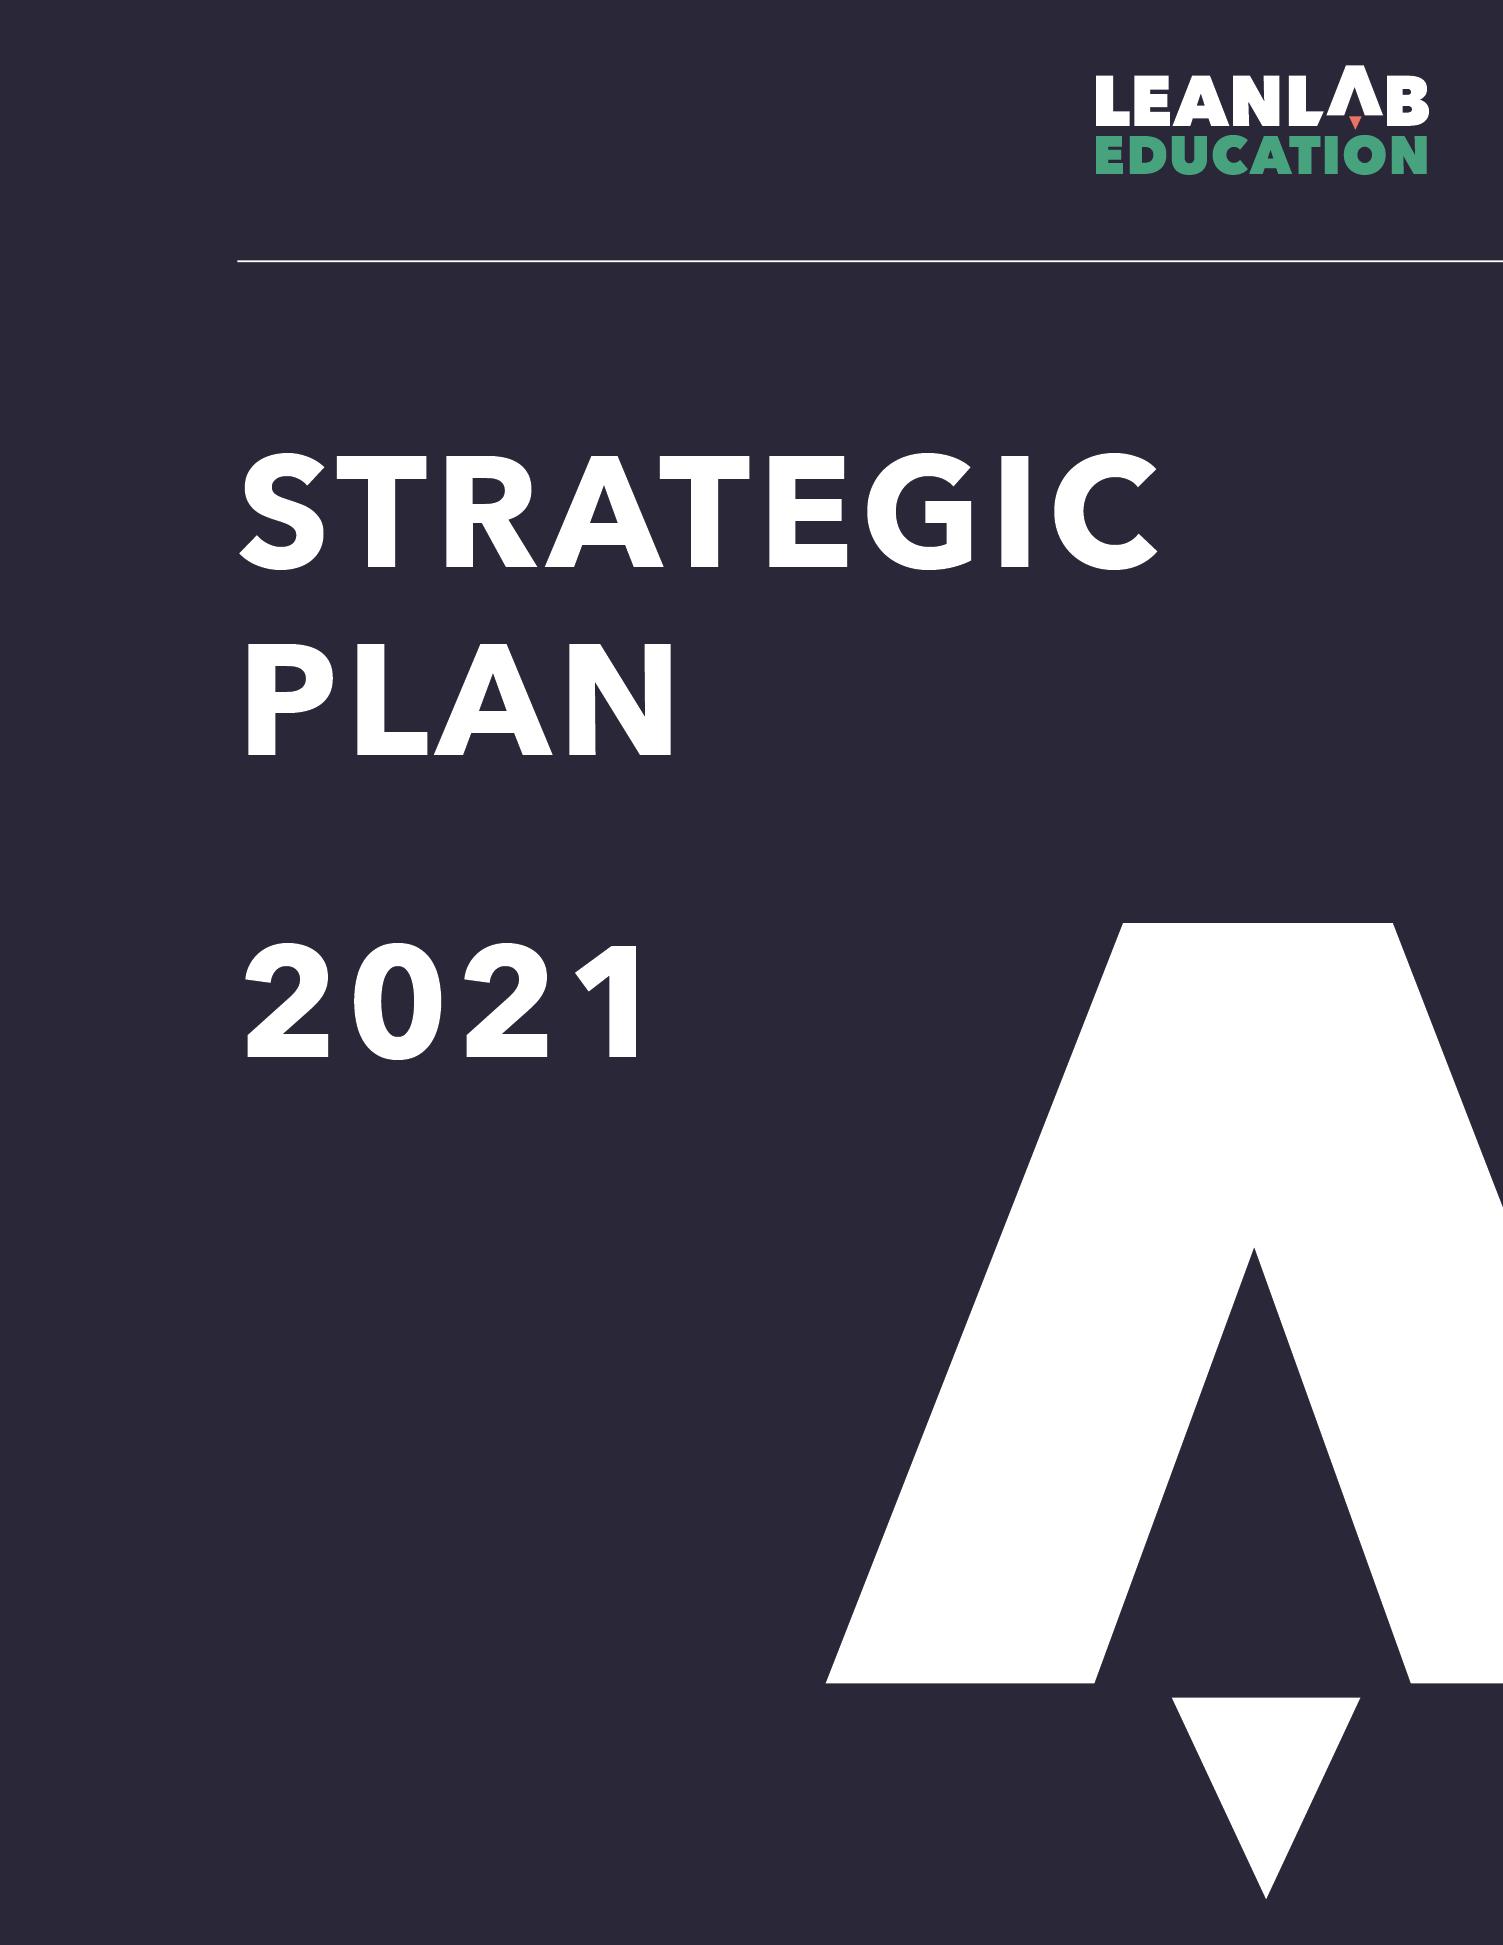 LEANLAB Strategic Plan